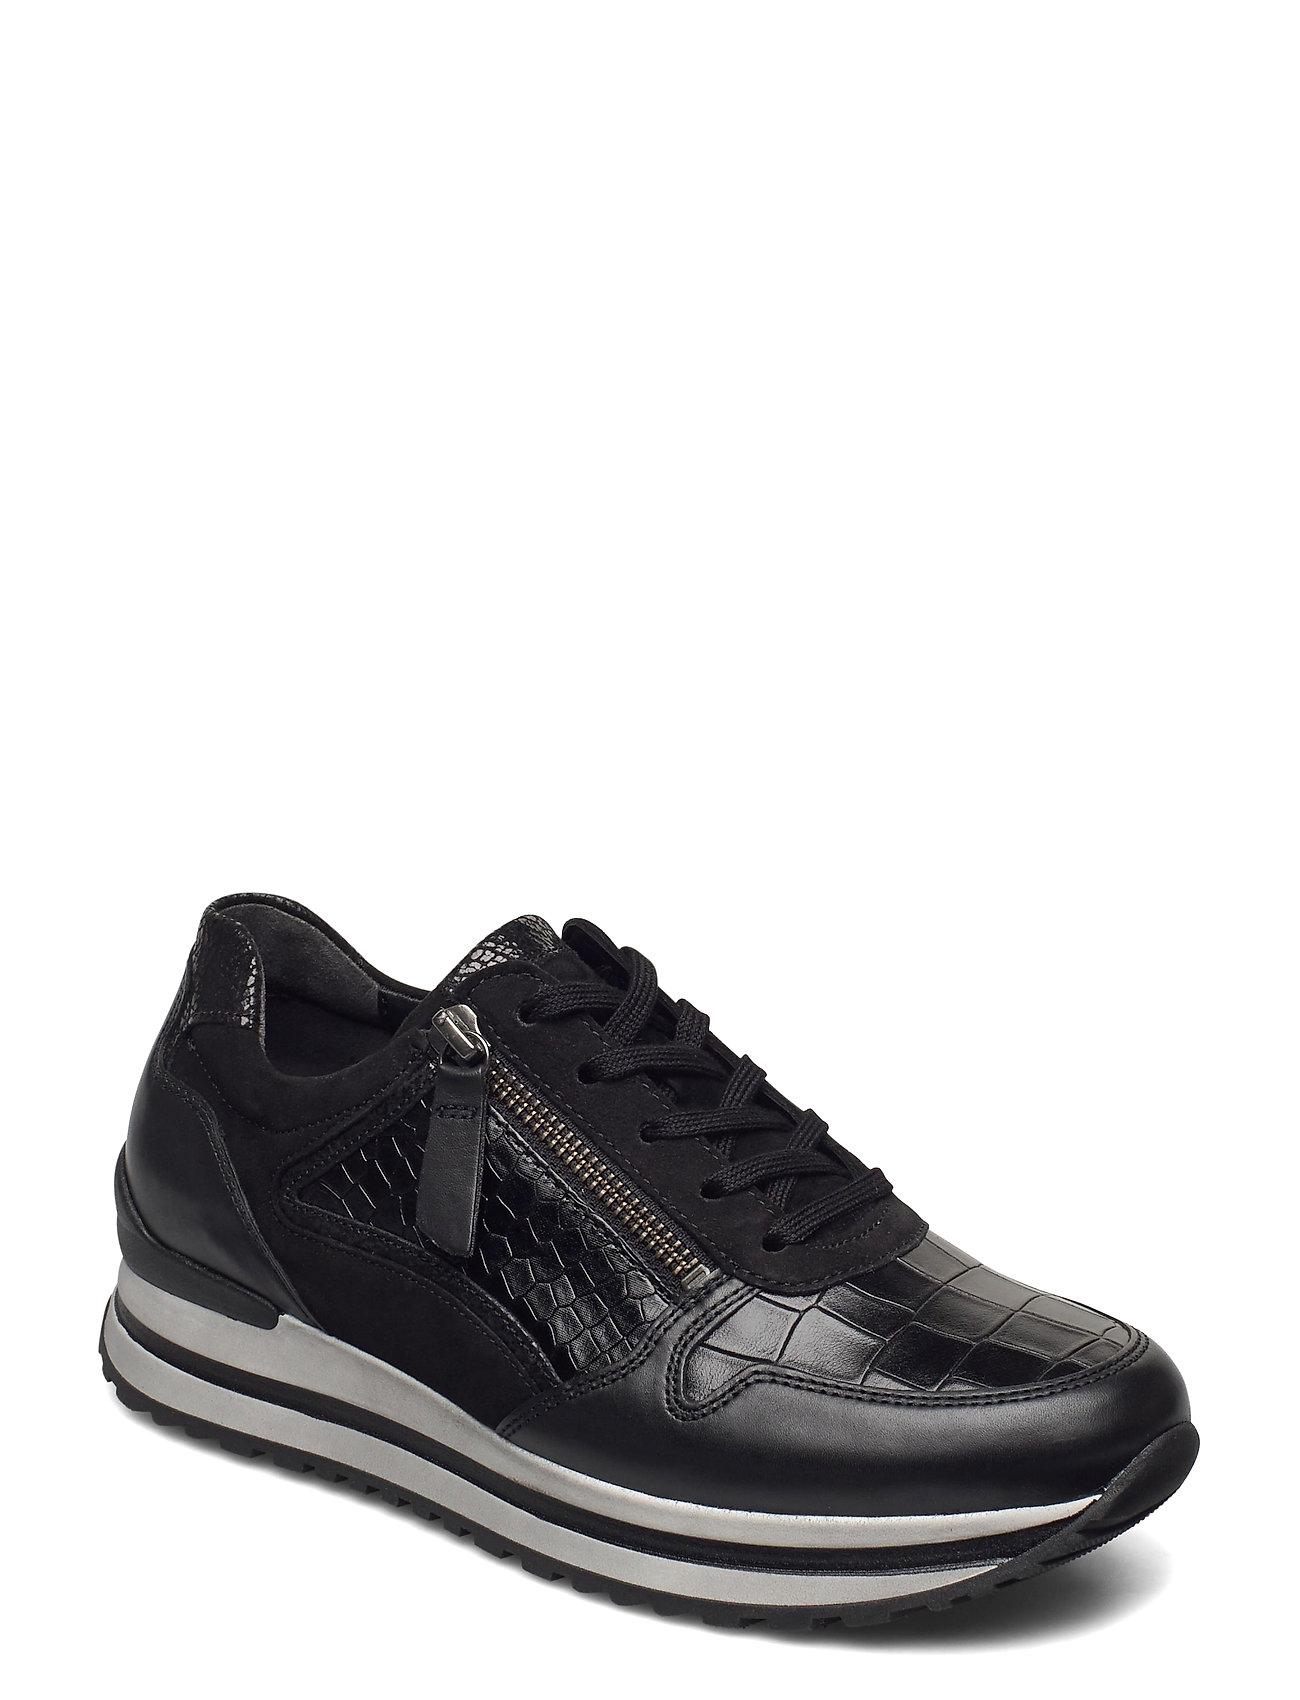 Image of Sneaker Low-top Sneakers Sort Gabor (3463420827)